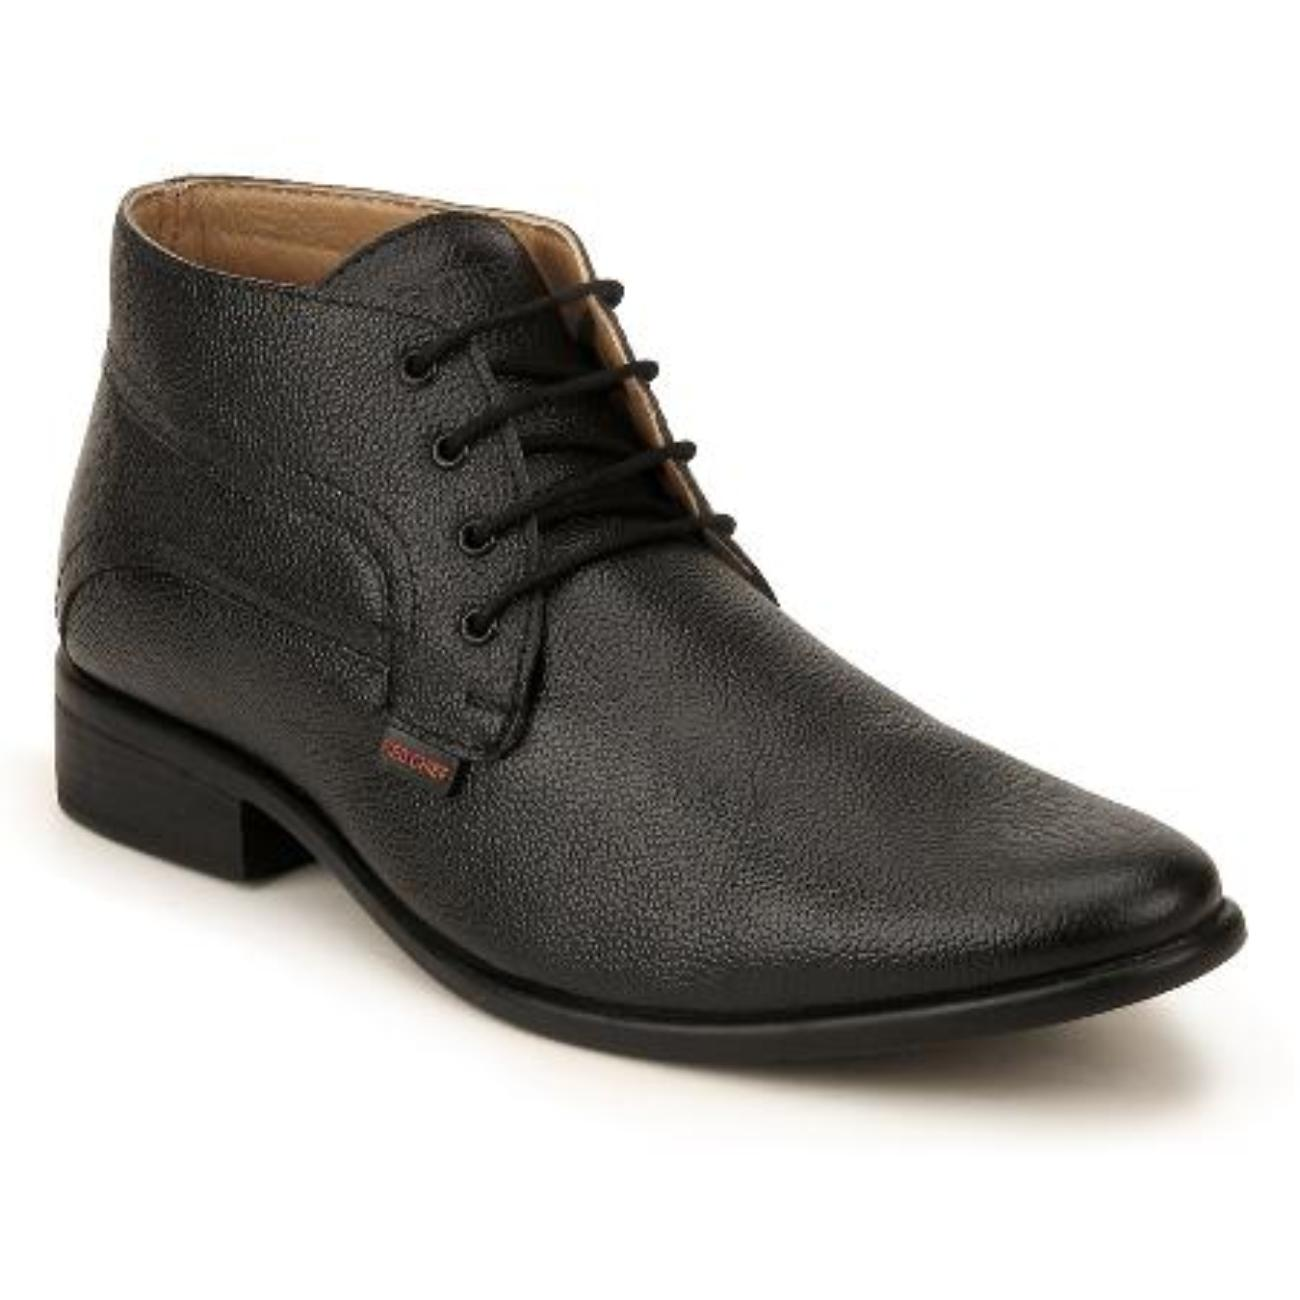 Buy Footwear for Men Online | Red Chief